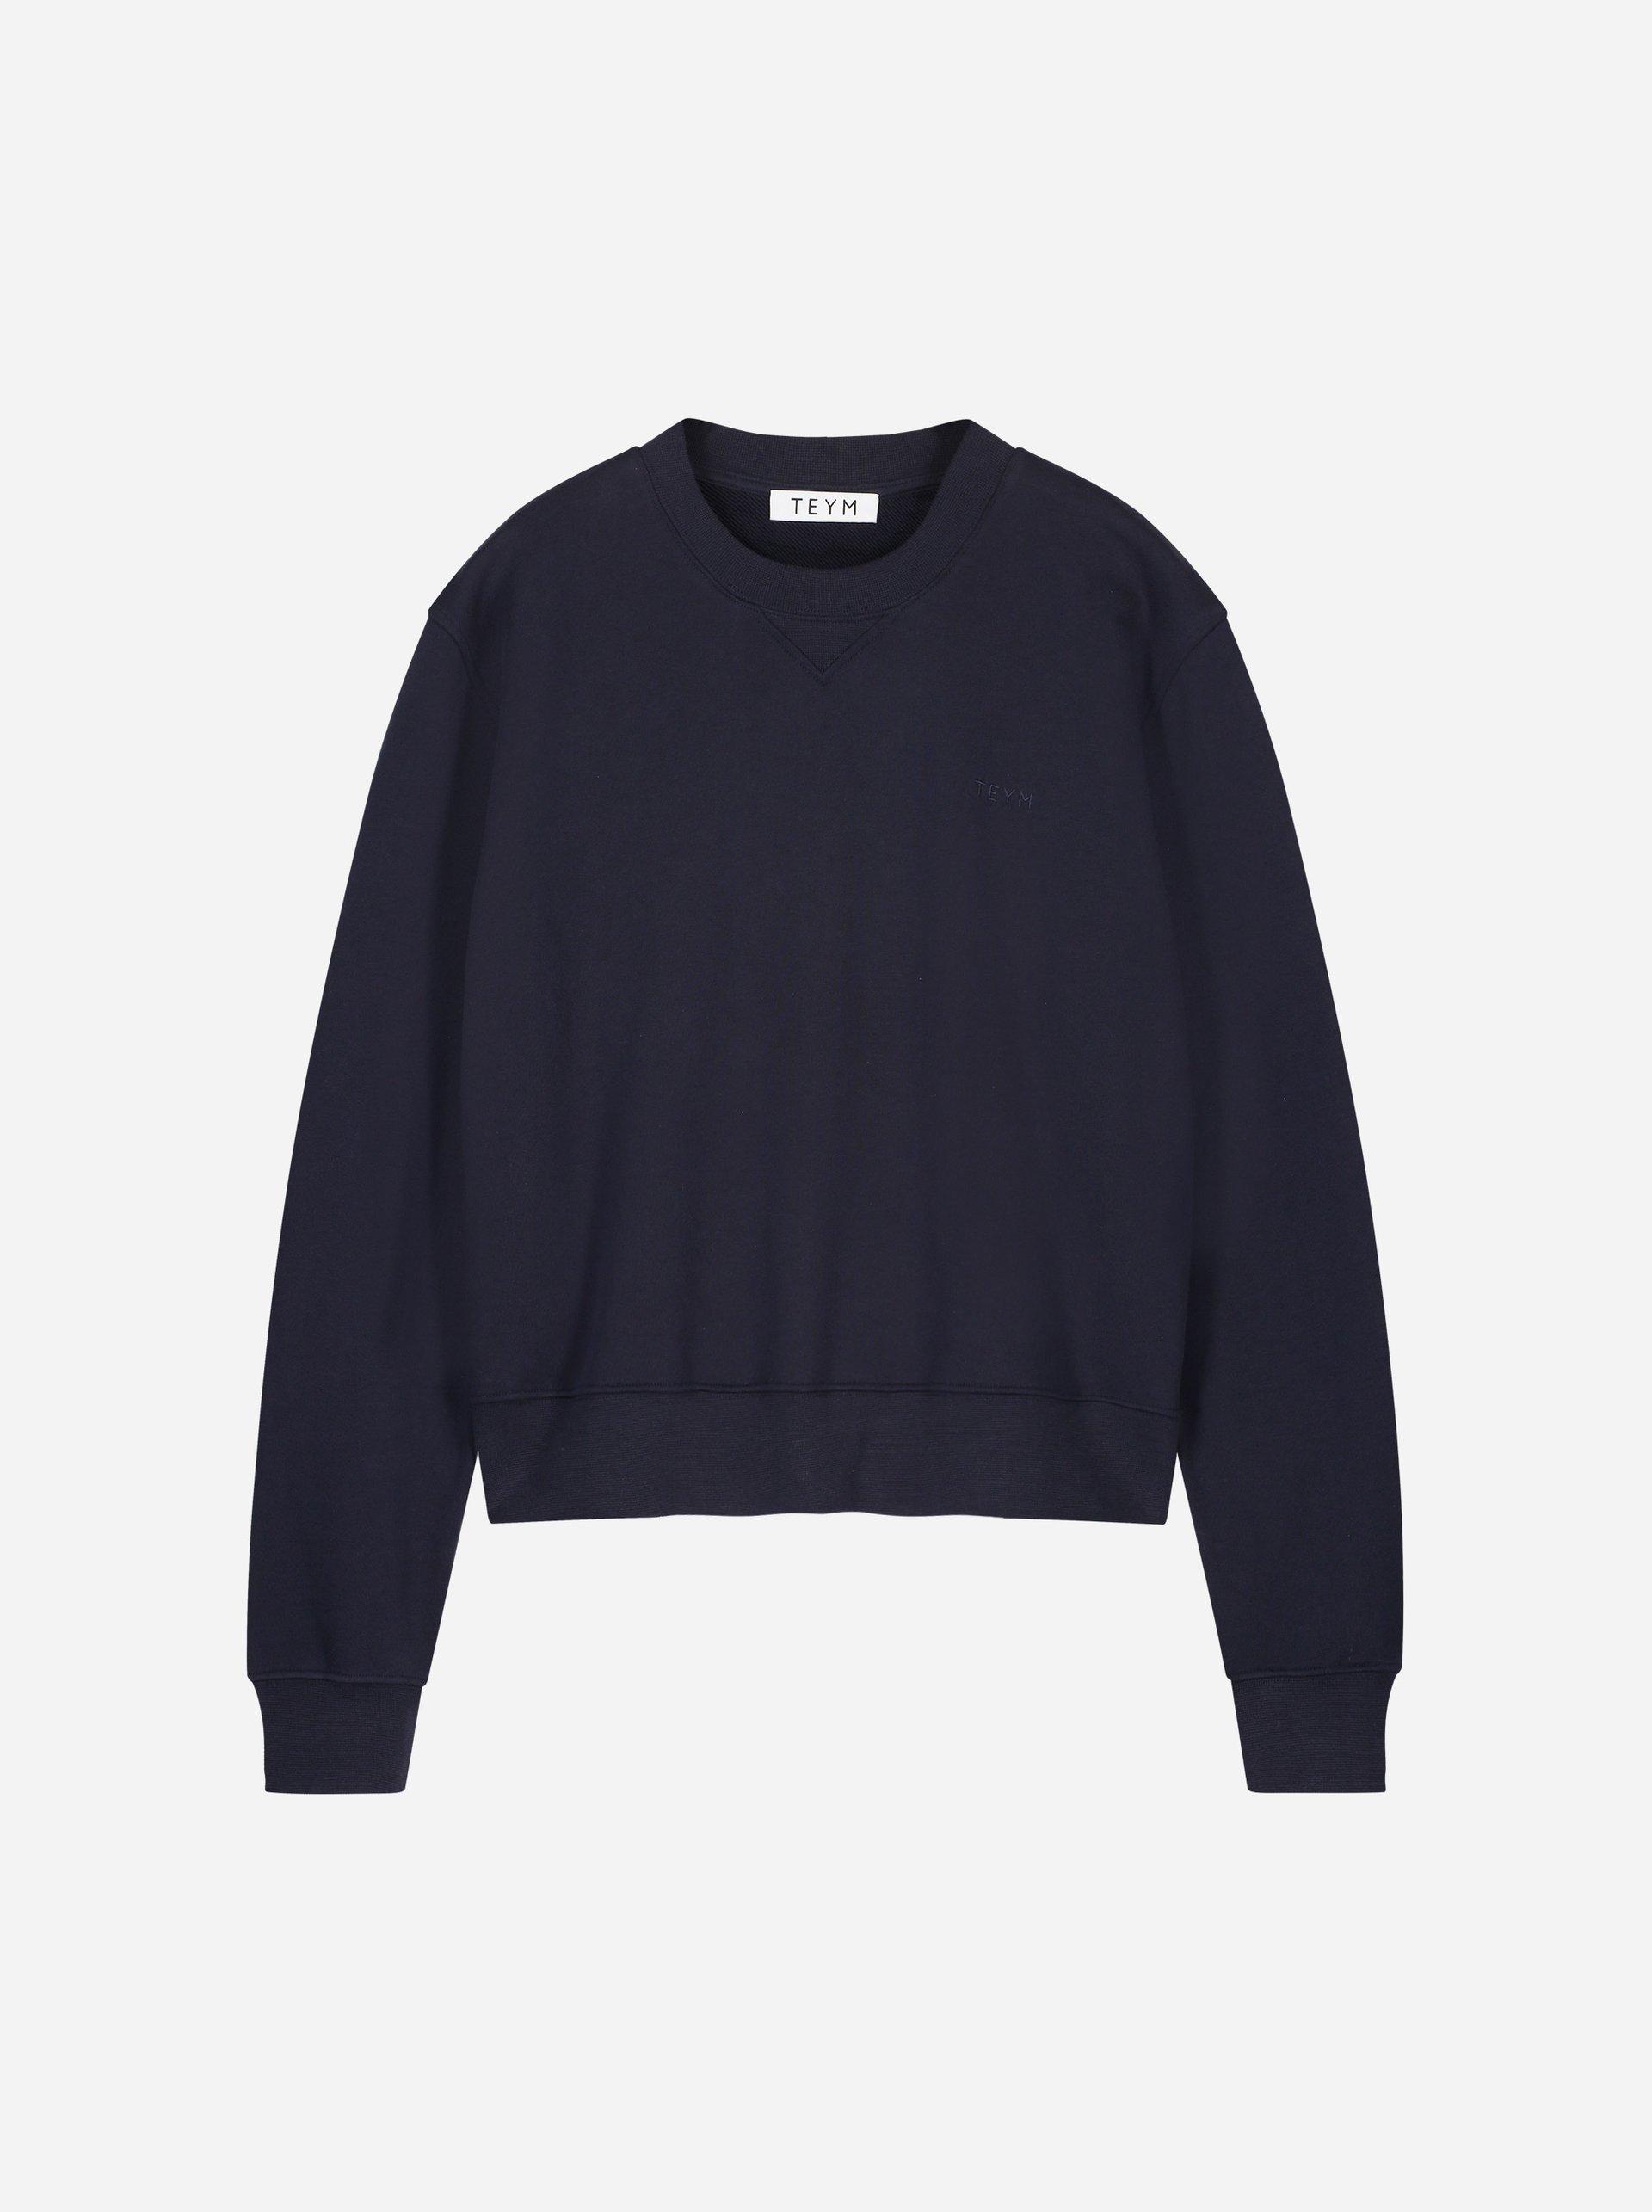 Teym-TheSweatshirt-Women-Blue05